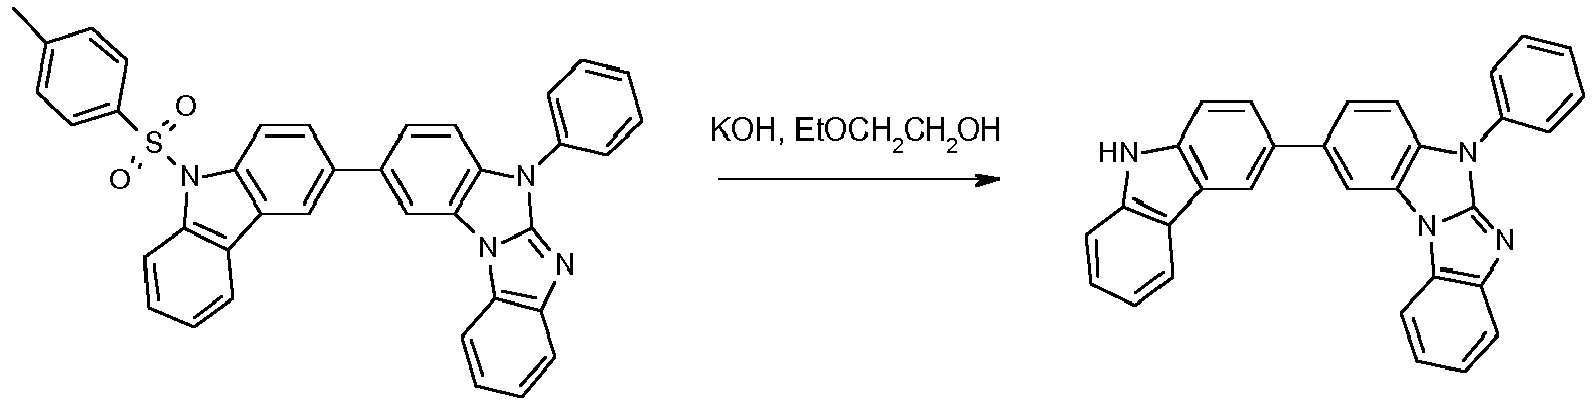 Figure imgb0865